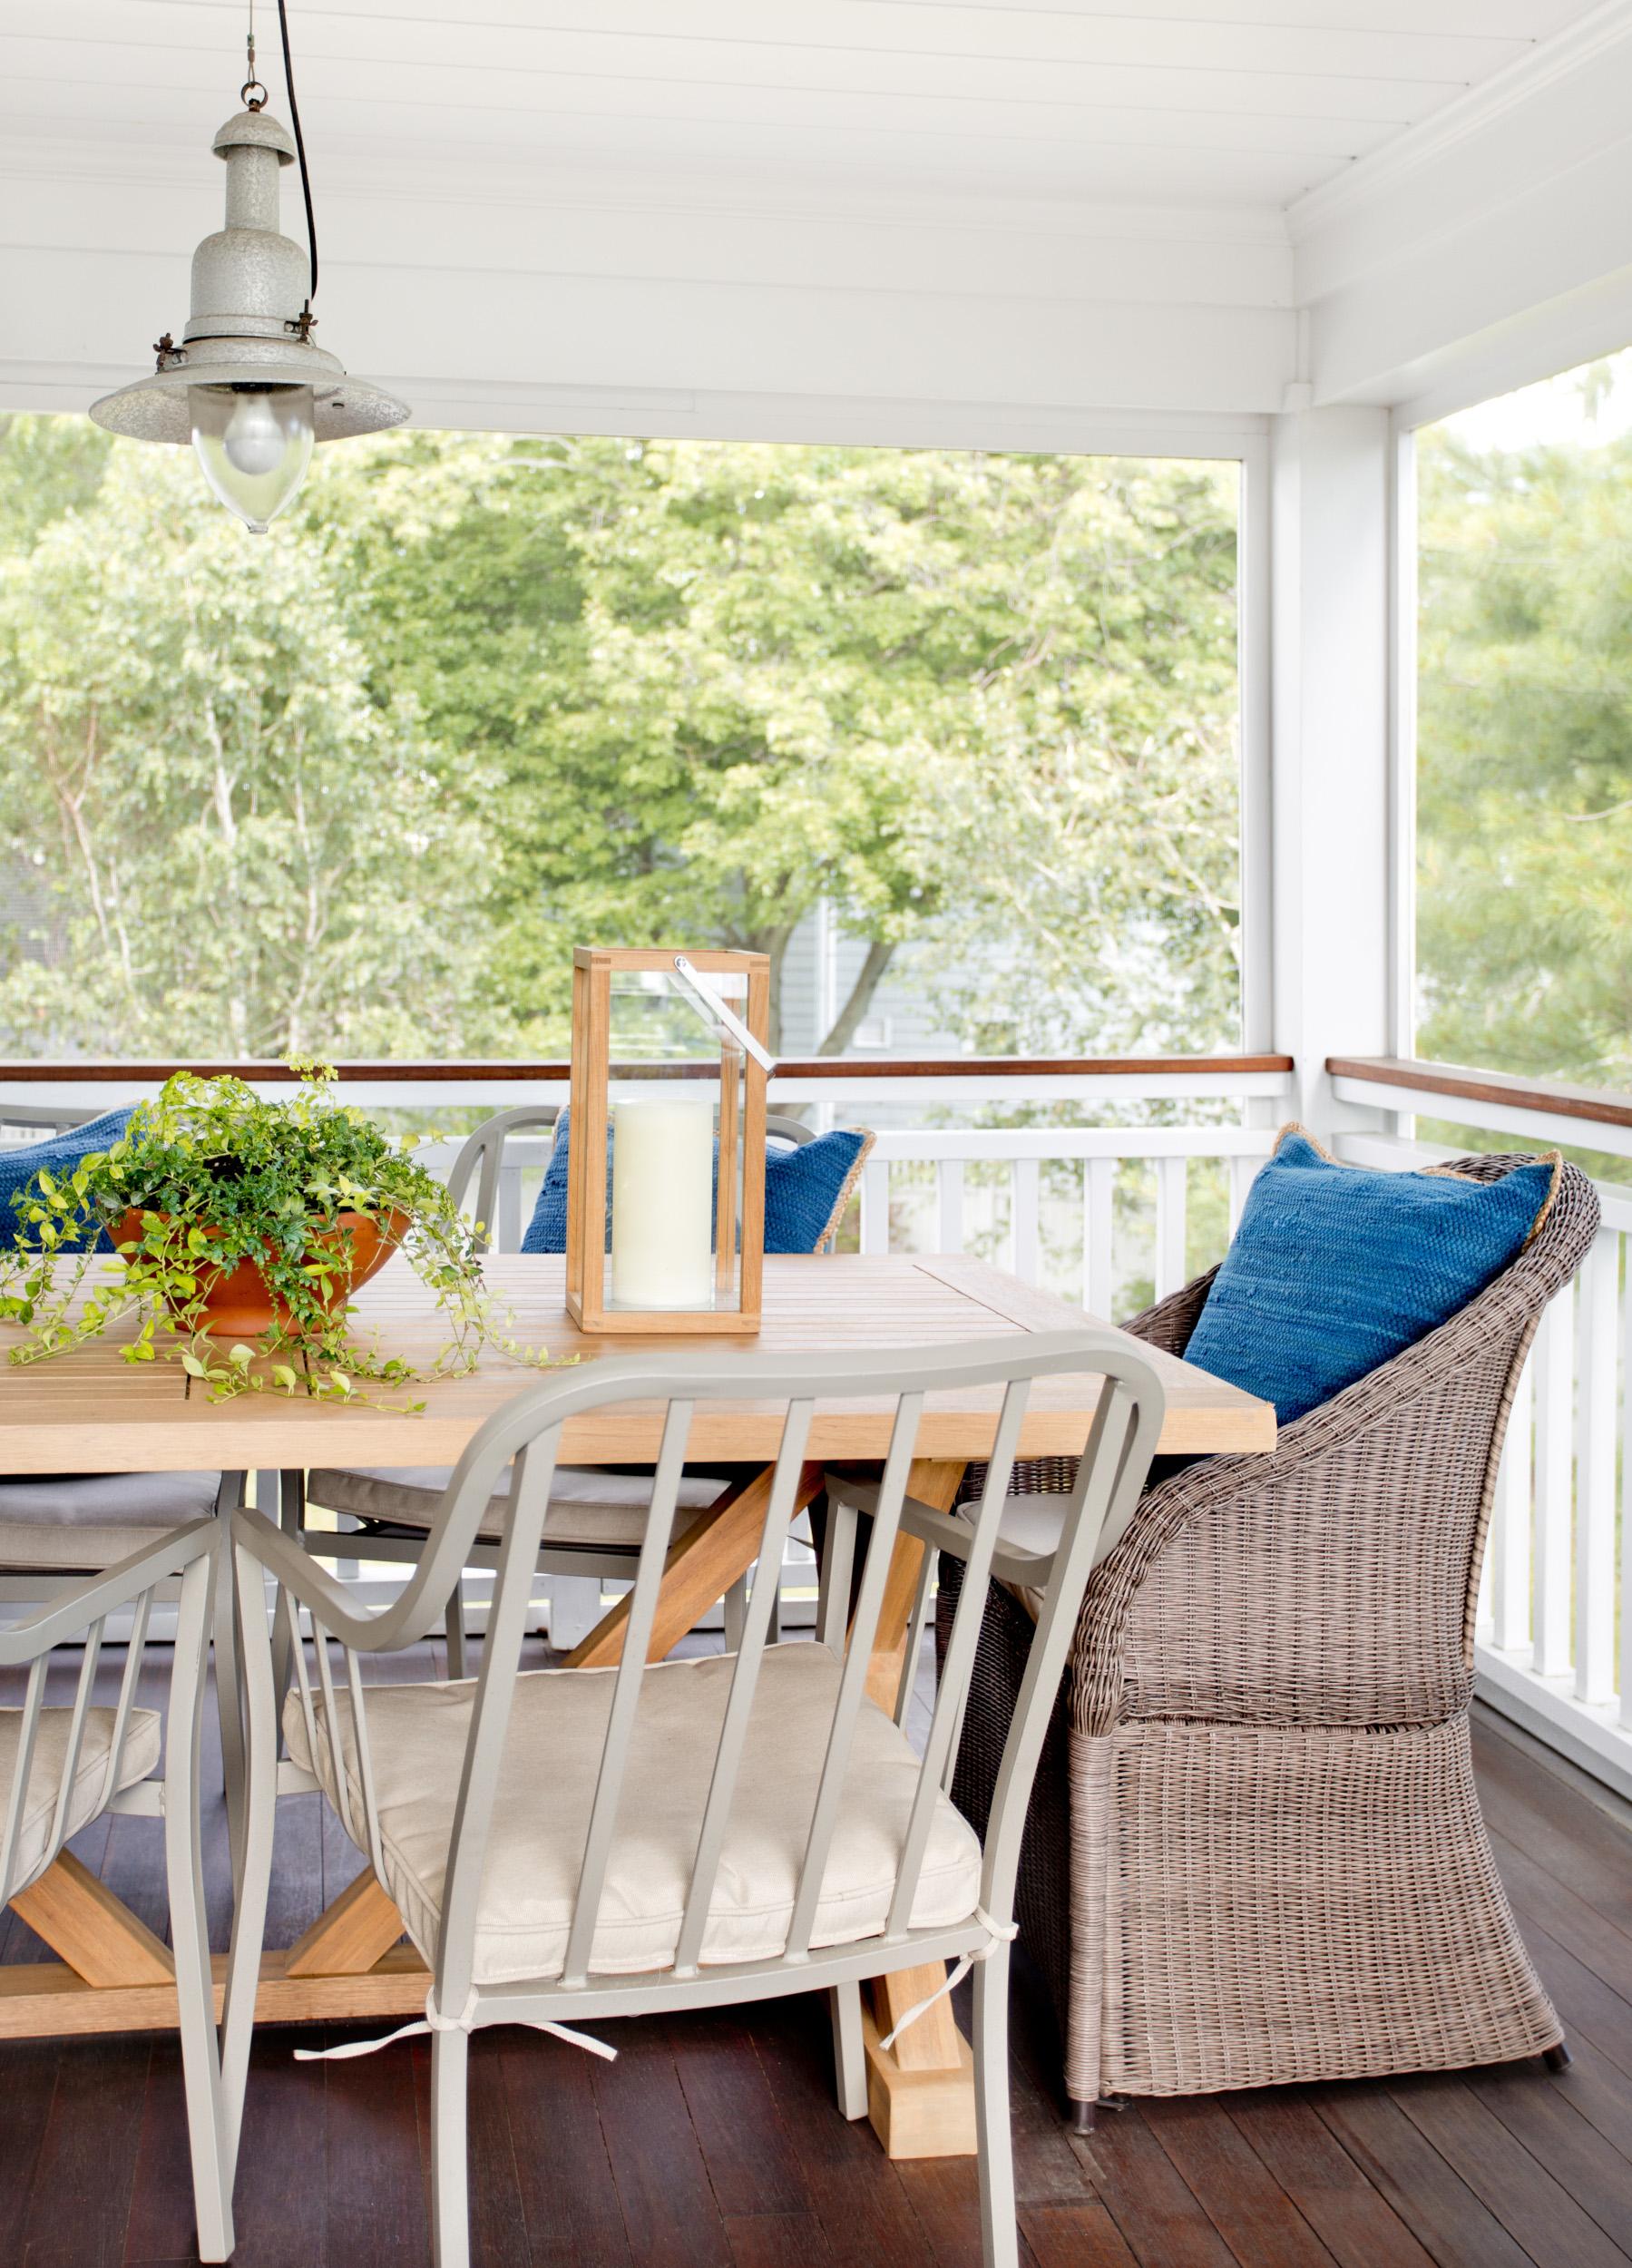 Outdoor Porch Design Ideas Caroline Kopp Interior Design Firms in Connecticut.jpg